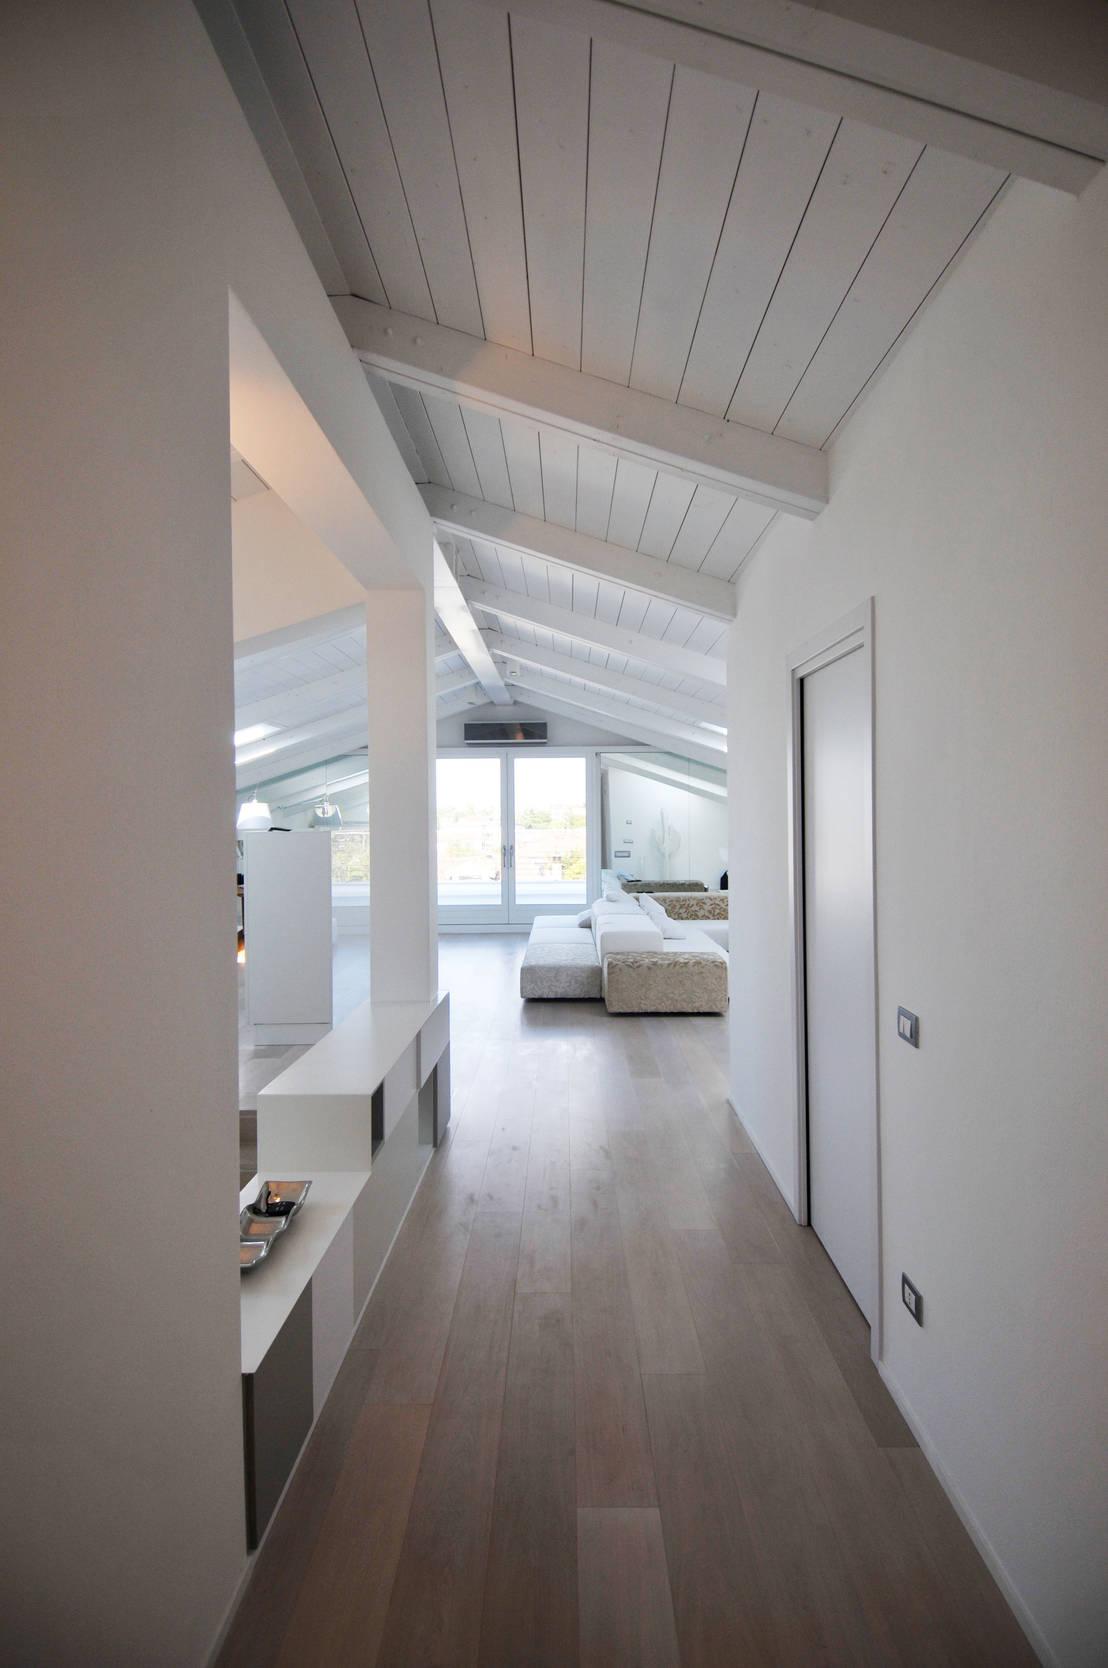 Interior design white loft treviso italy by imago for Imago design